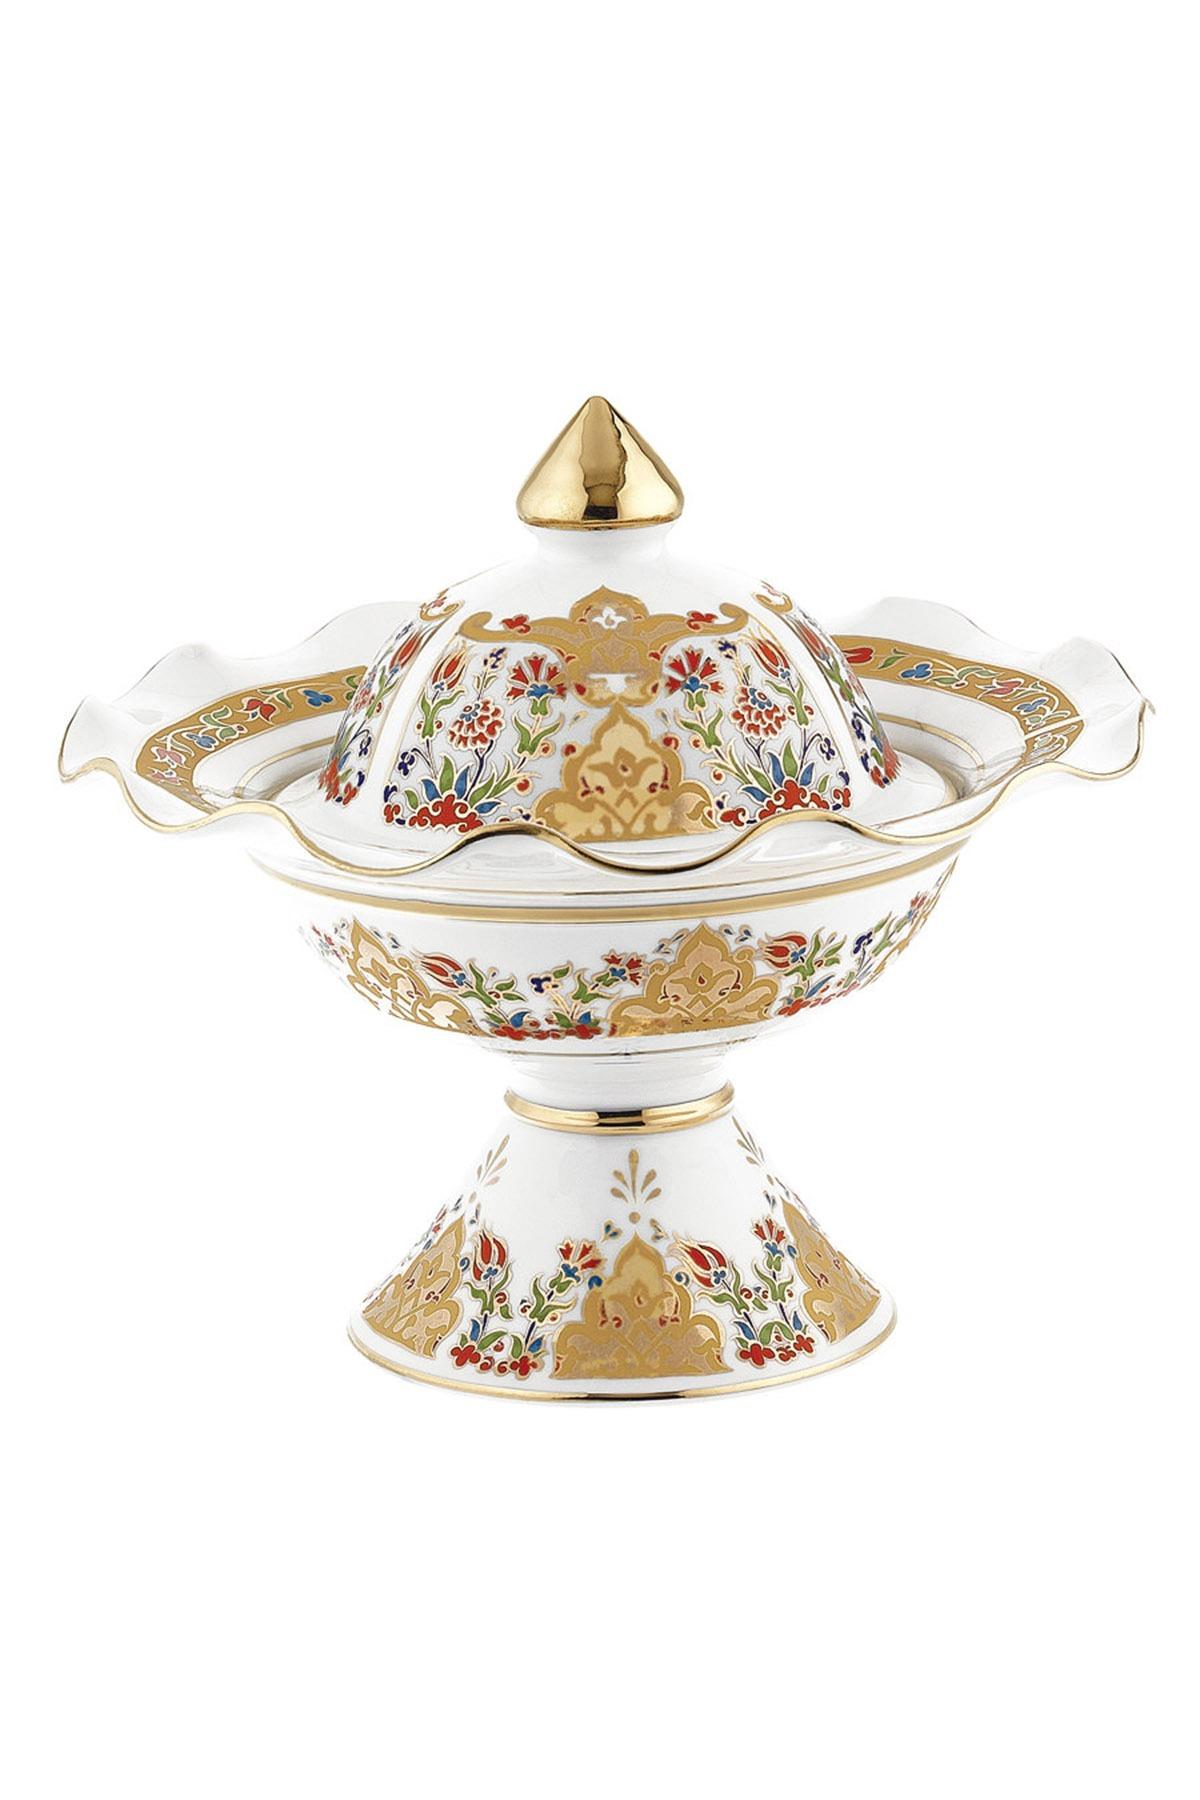 Kütahya Porselen - Hanedan Şekerlik 22 Cm Dekor No:412